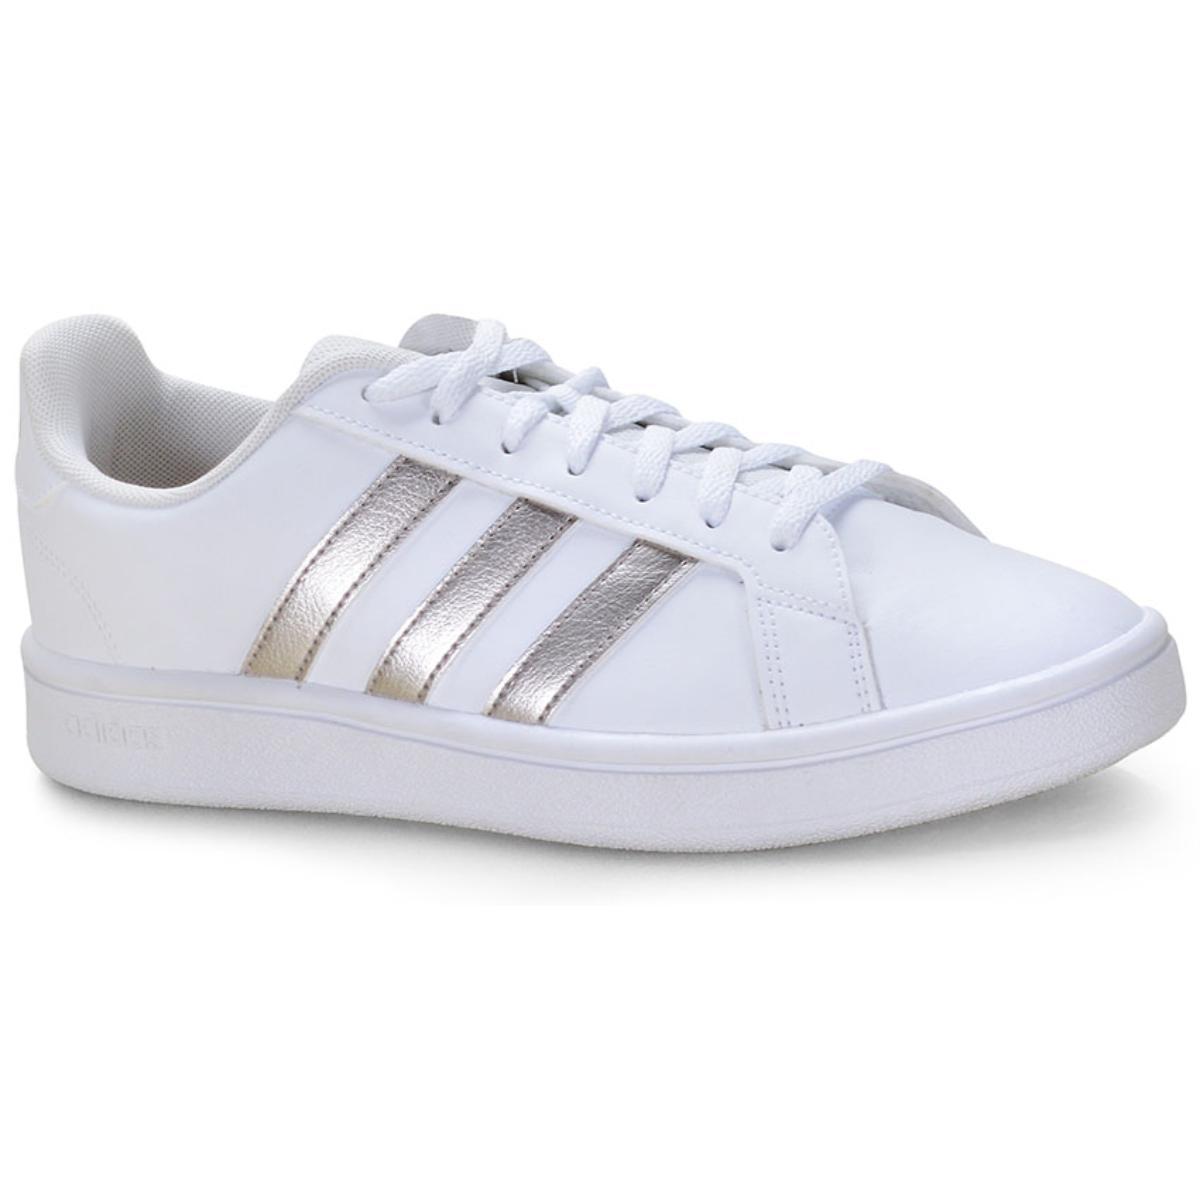 Tênis Feminino Adidas Ee7874 Grand Court Base w Branco/prata